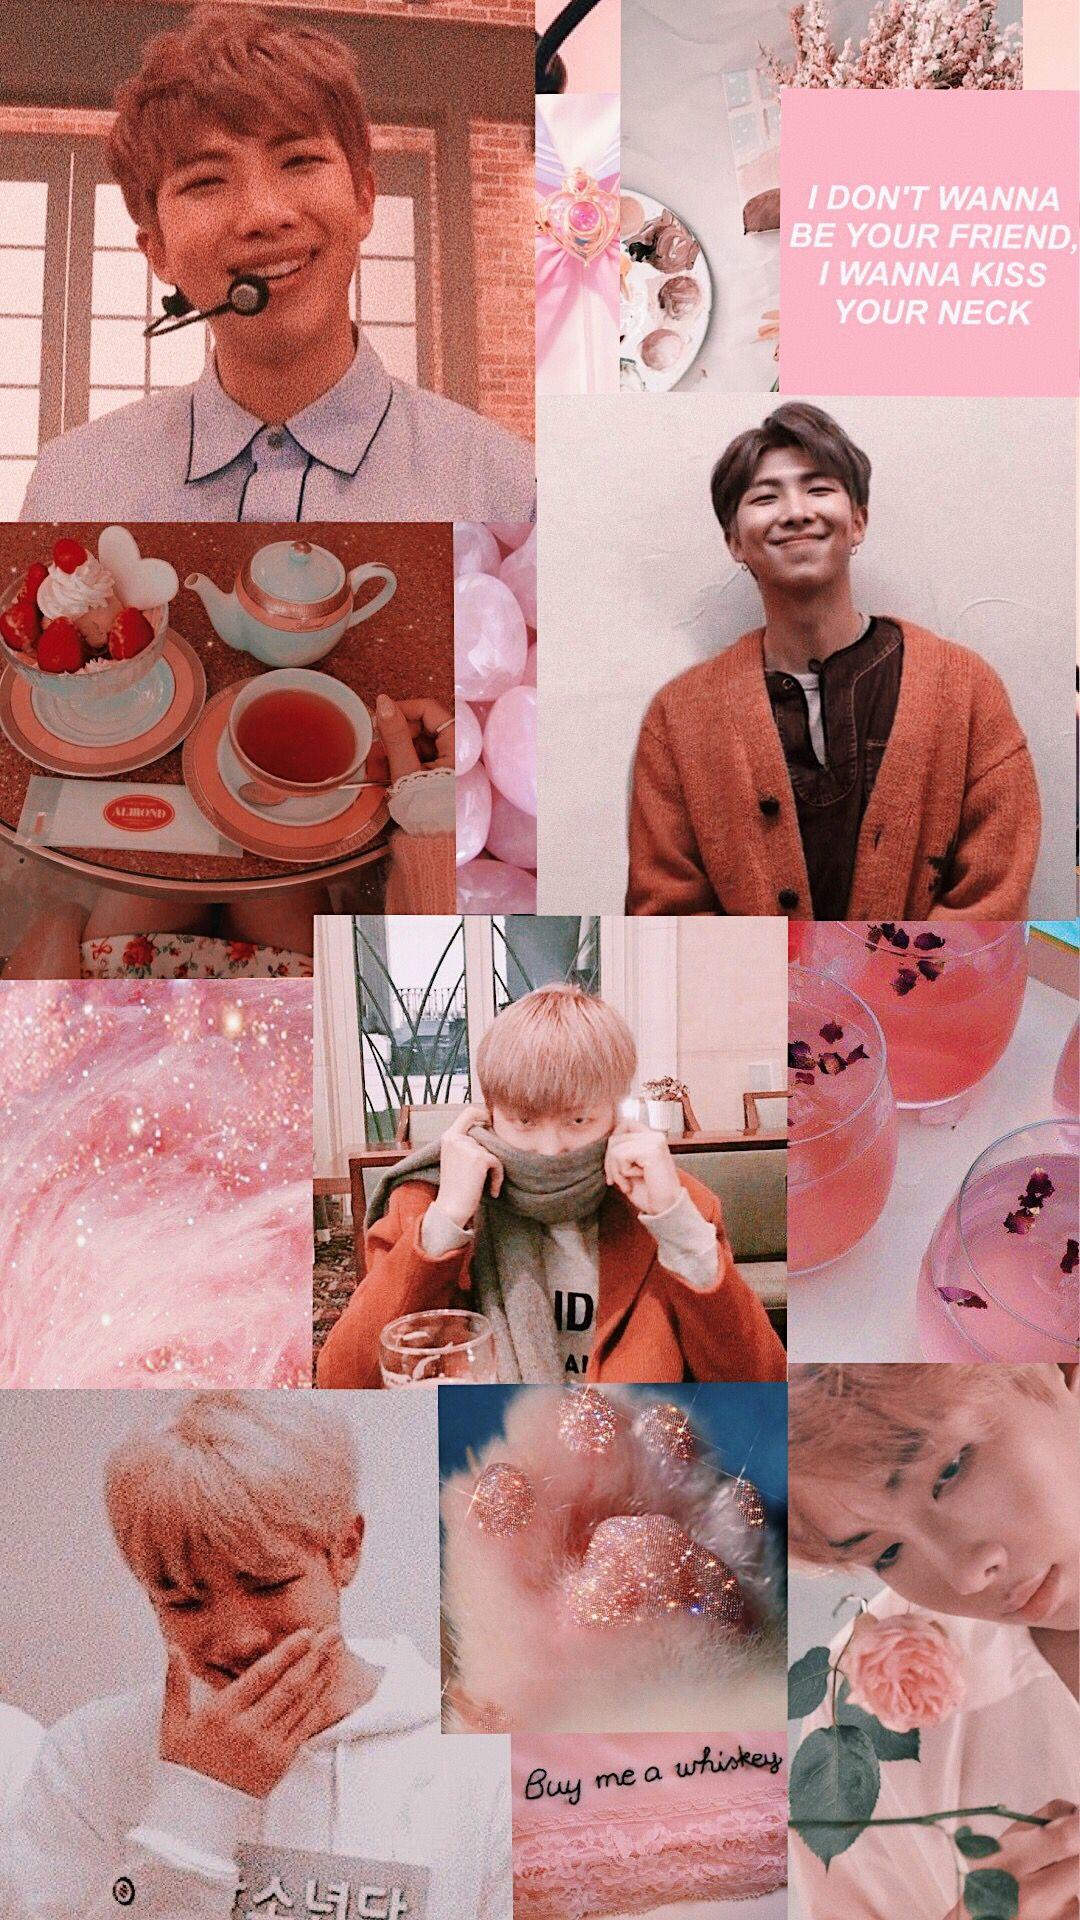 Bts Namjoon Pink Aesthetic Wallpaper Namjoon Pink Bts Pink Aesthetic Bts Pink Aesthetic Wallpaper Wallpaper aesthetic rm bts